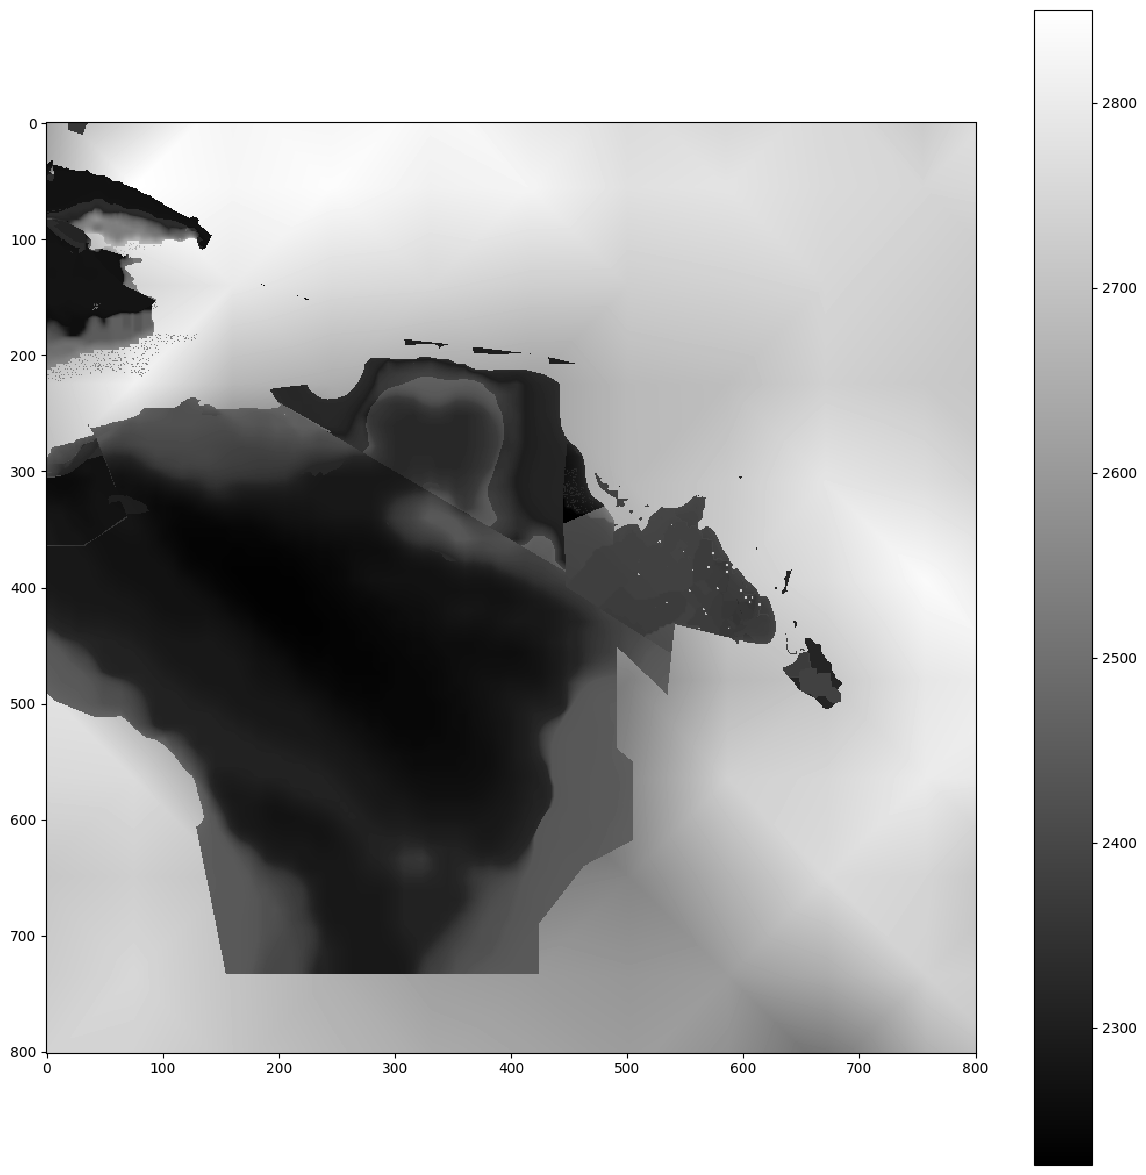 bench/seismic/wp/la_habra/meshes/velocity_model/plots/rho_1000.png